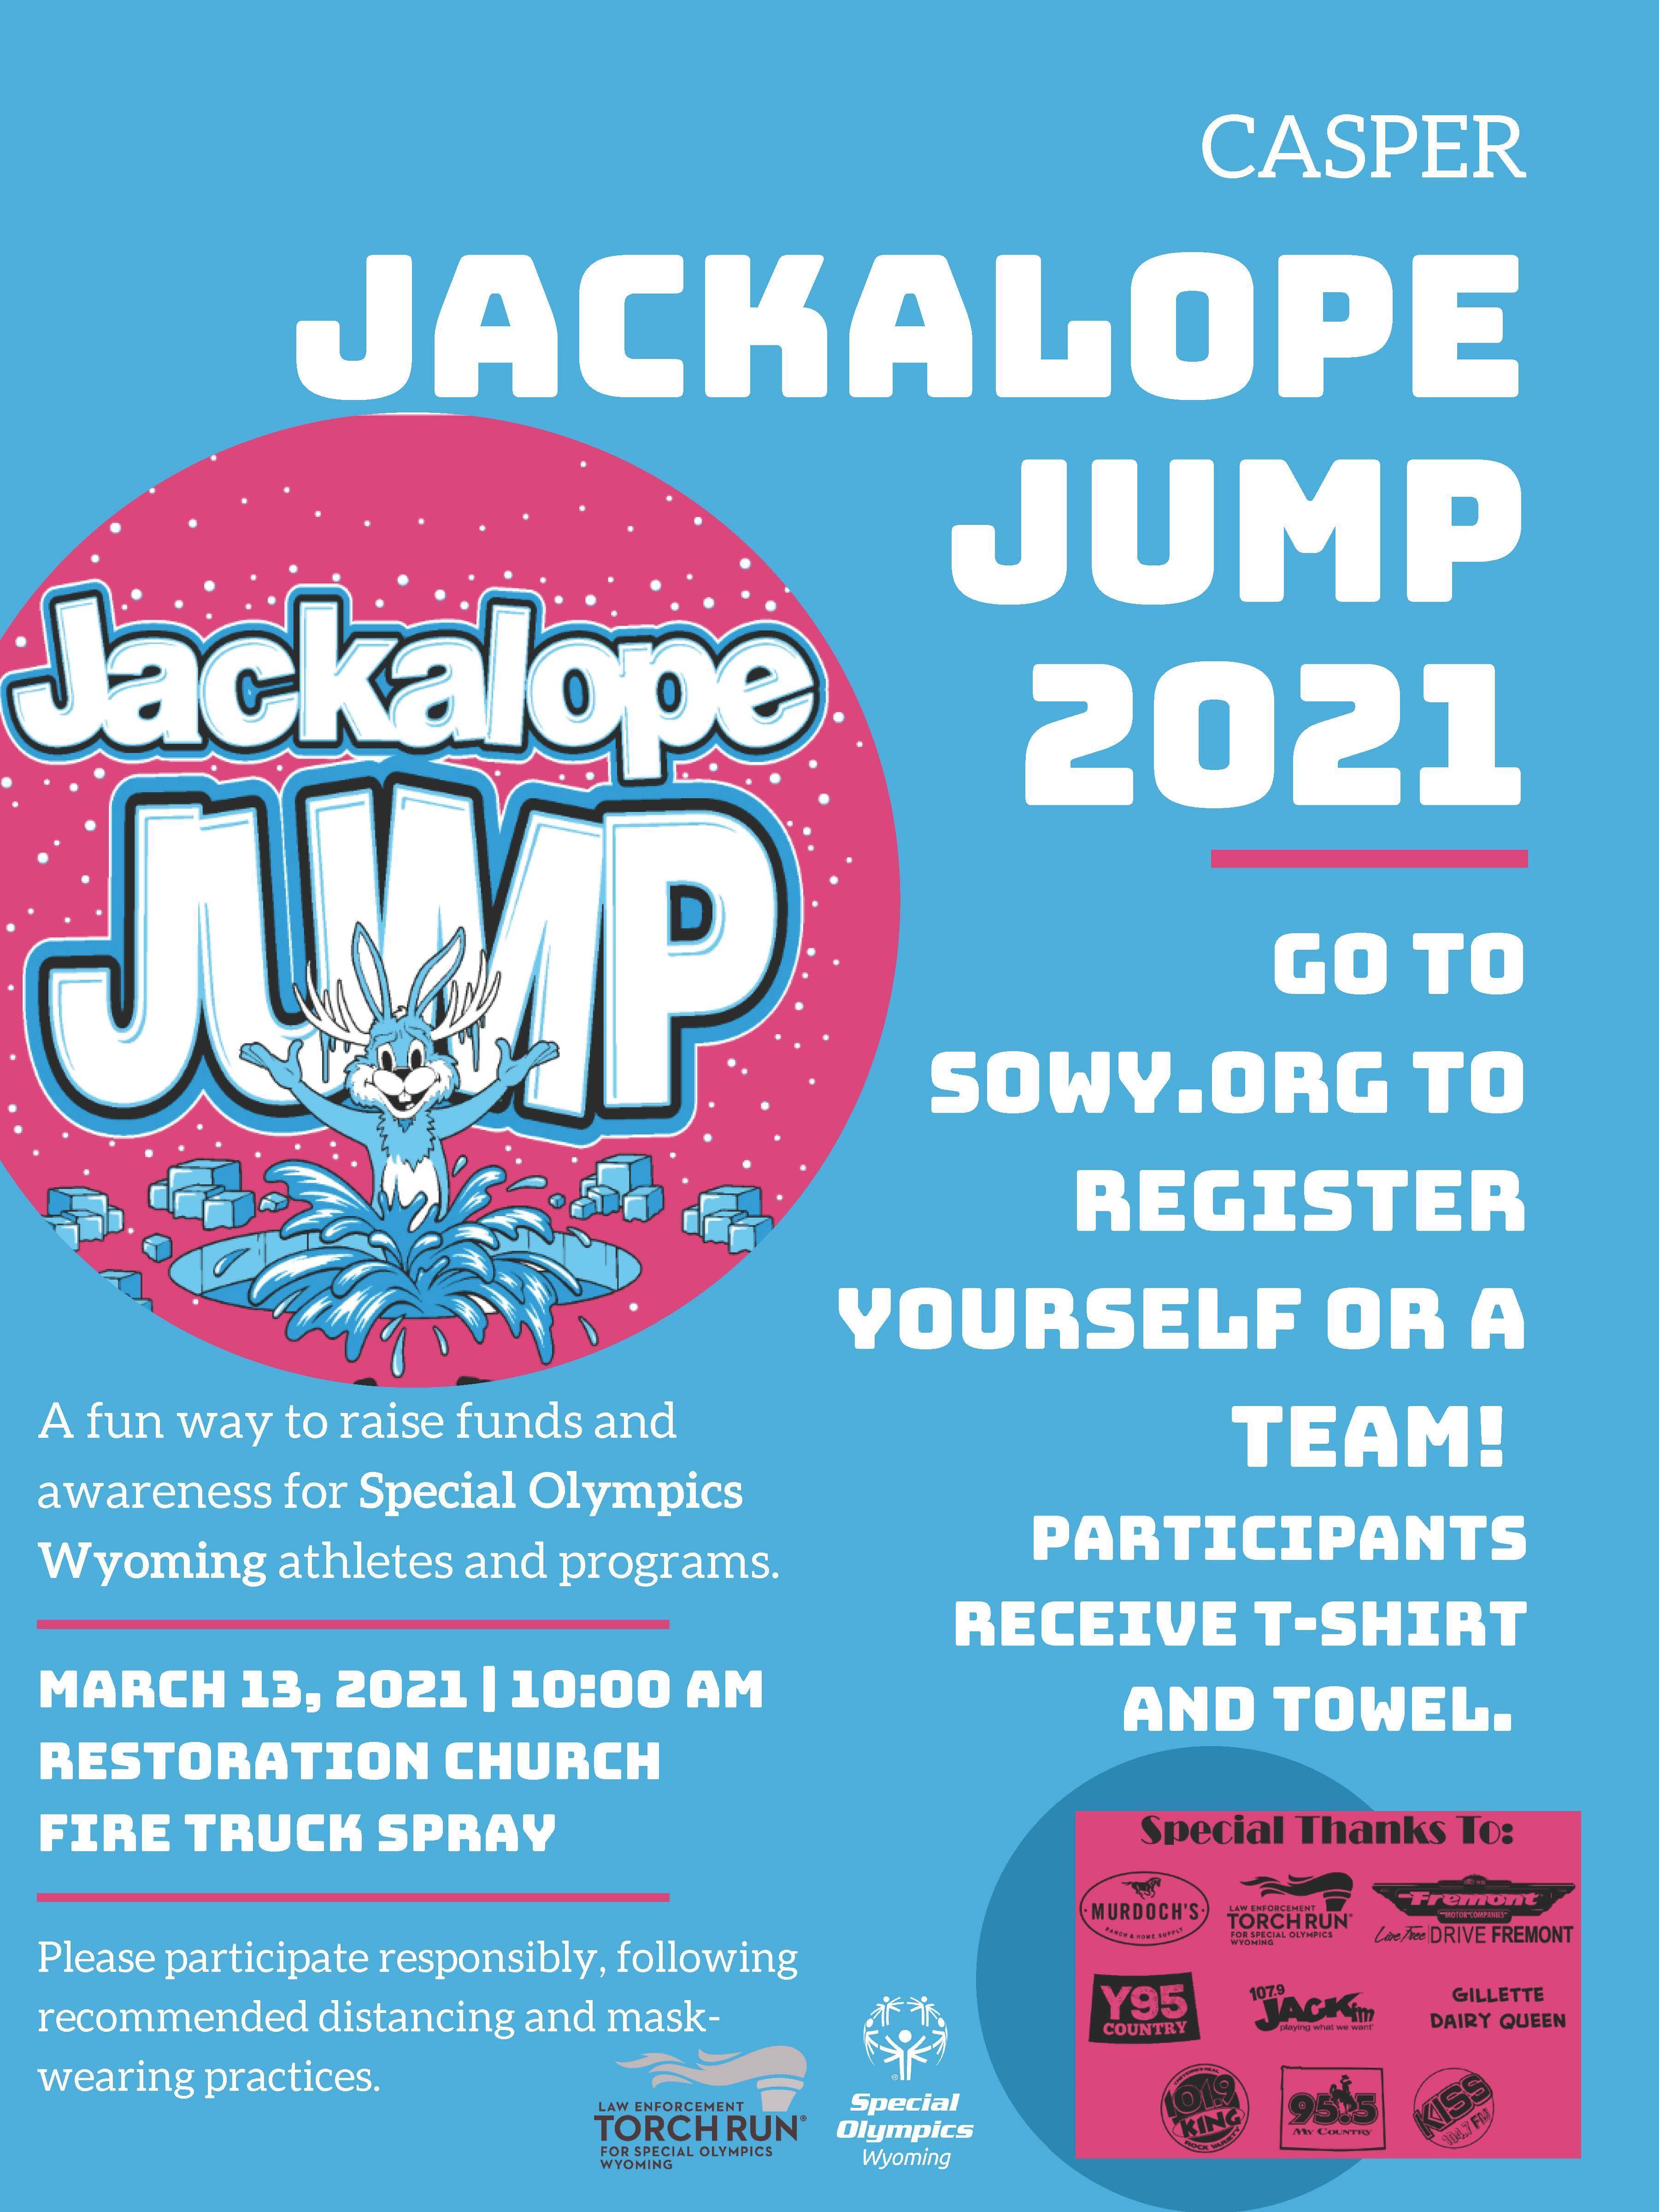 2021 Jackalope Jump Competition flyer